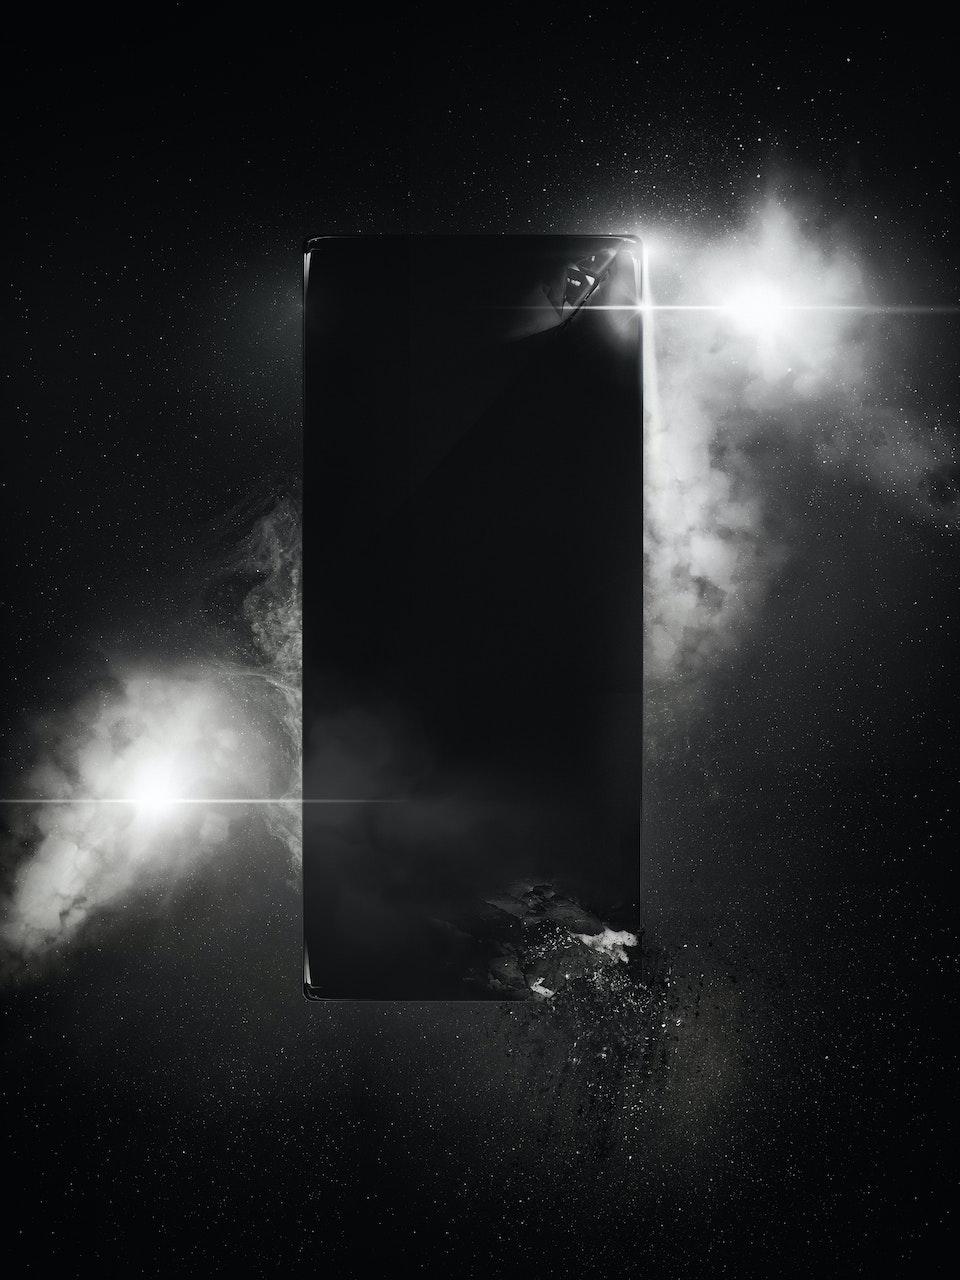 Monoliths - Monolith I (2011)